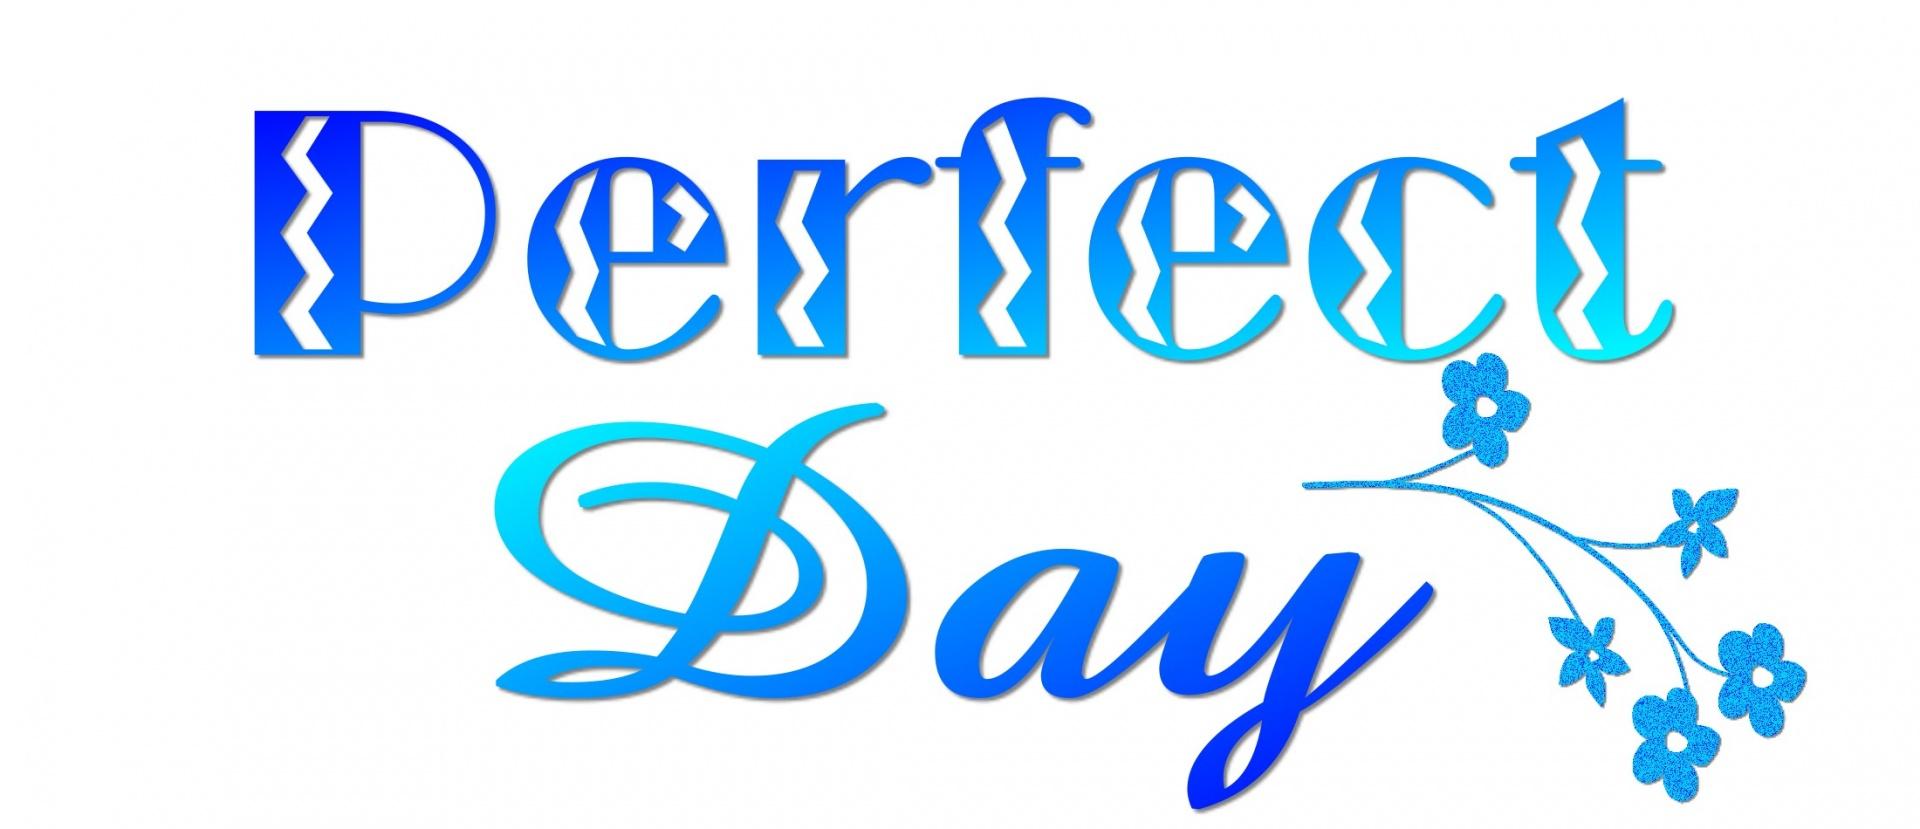 Describe Your Idea of a Perfect Day.